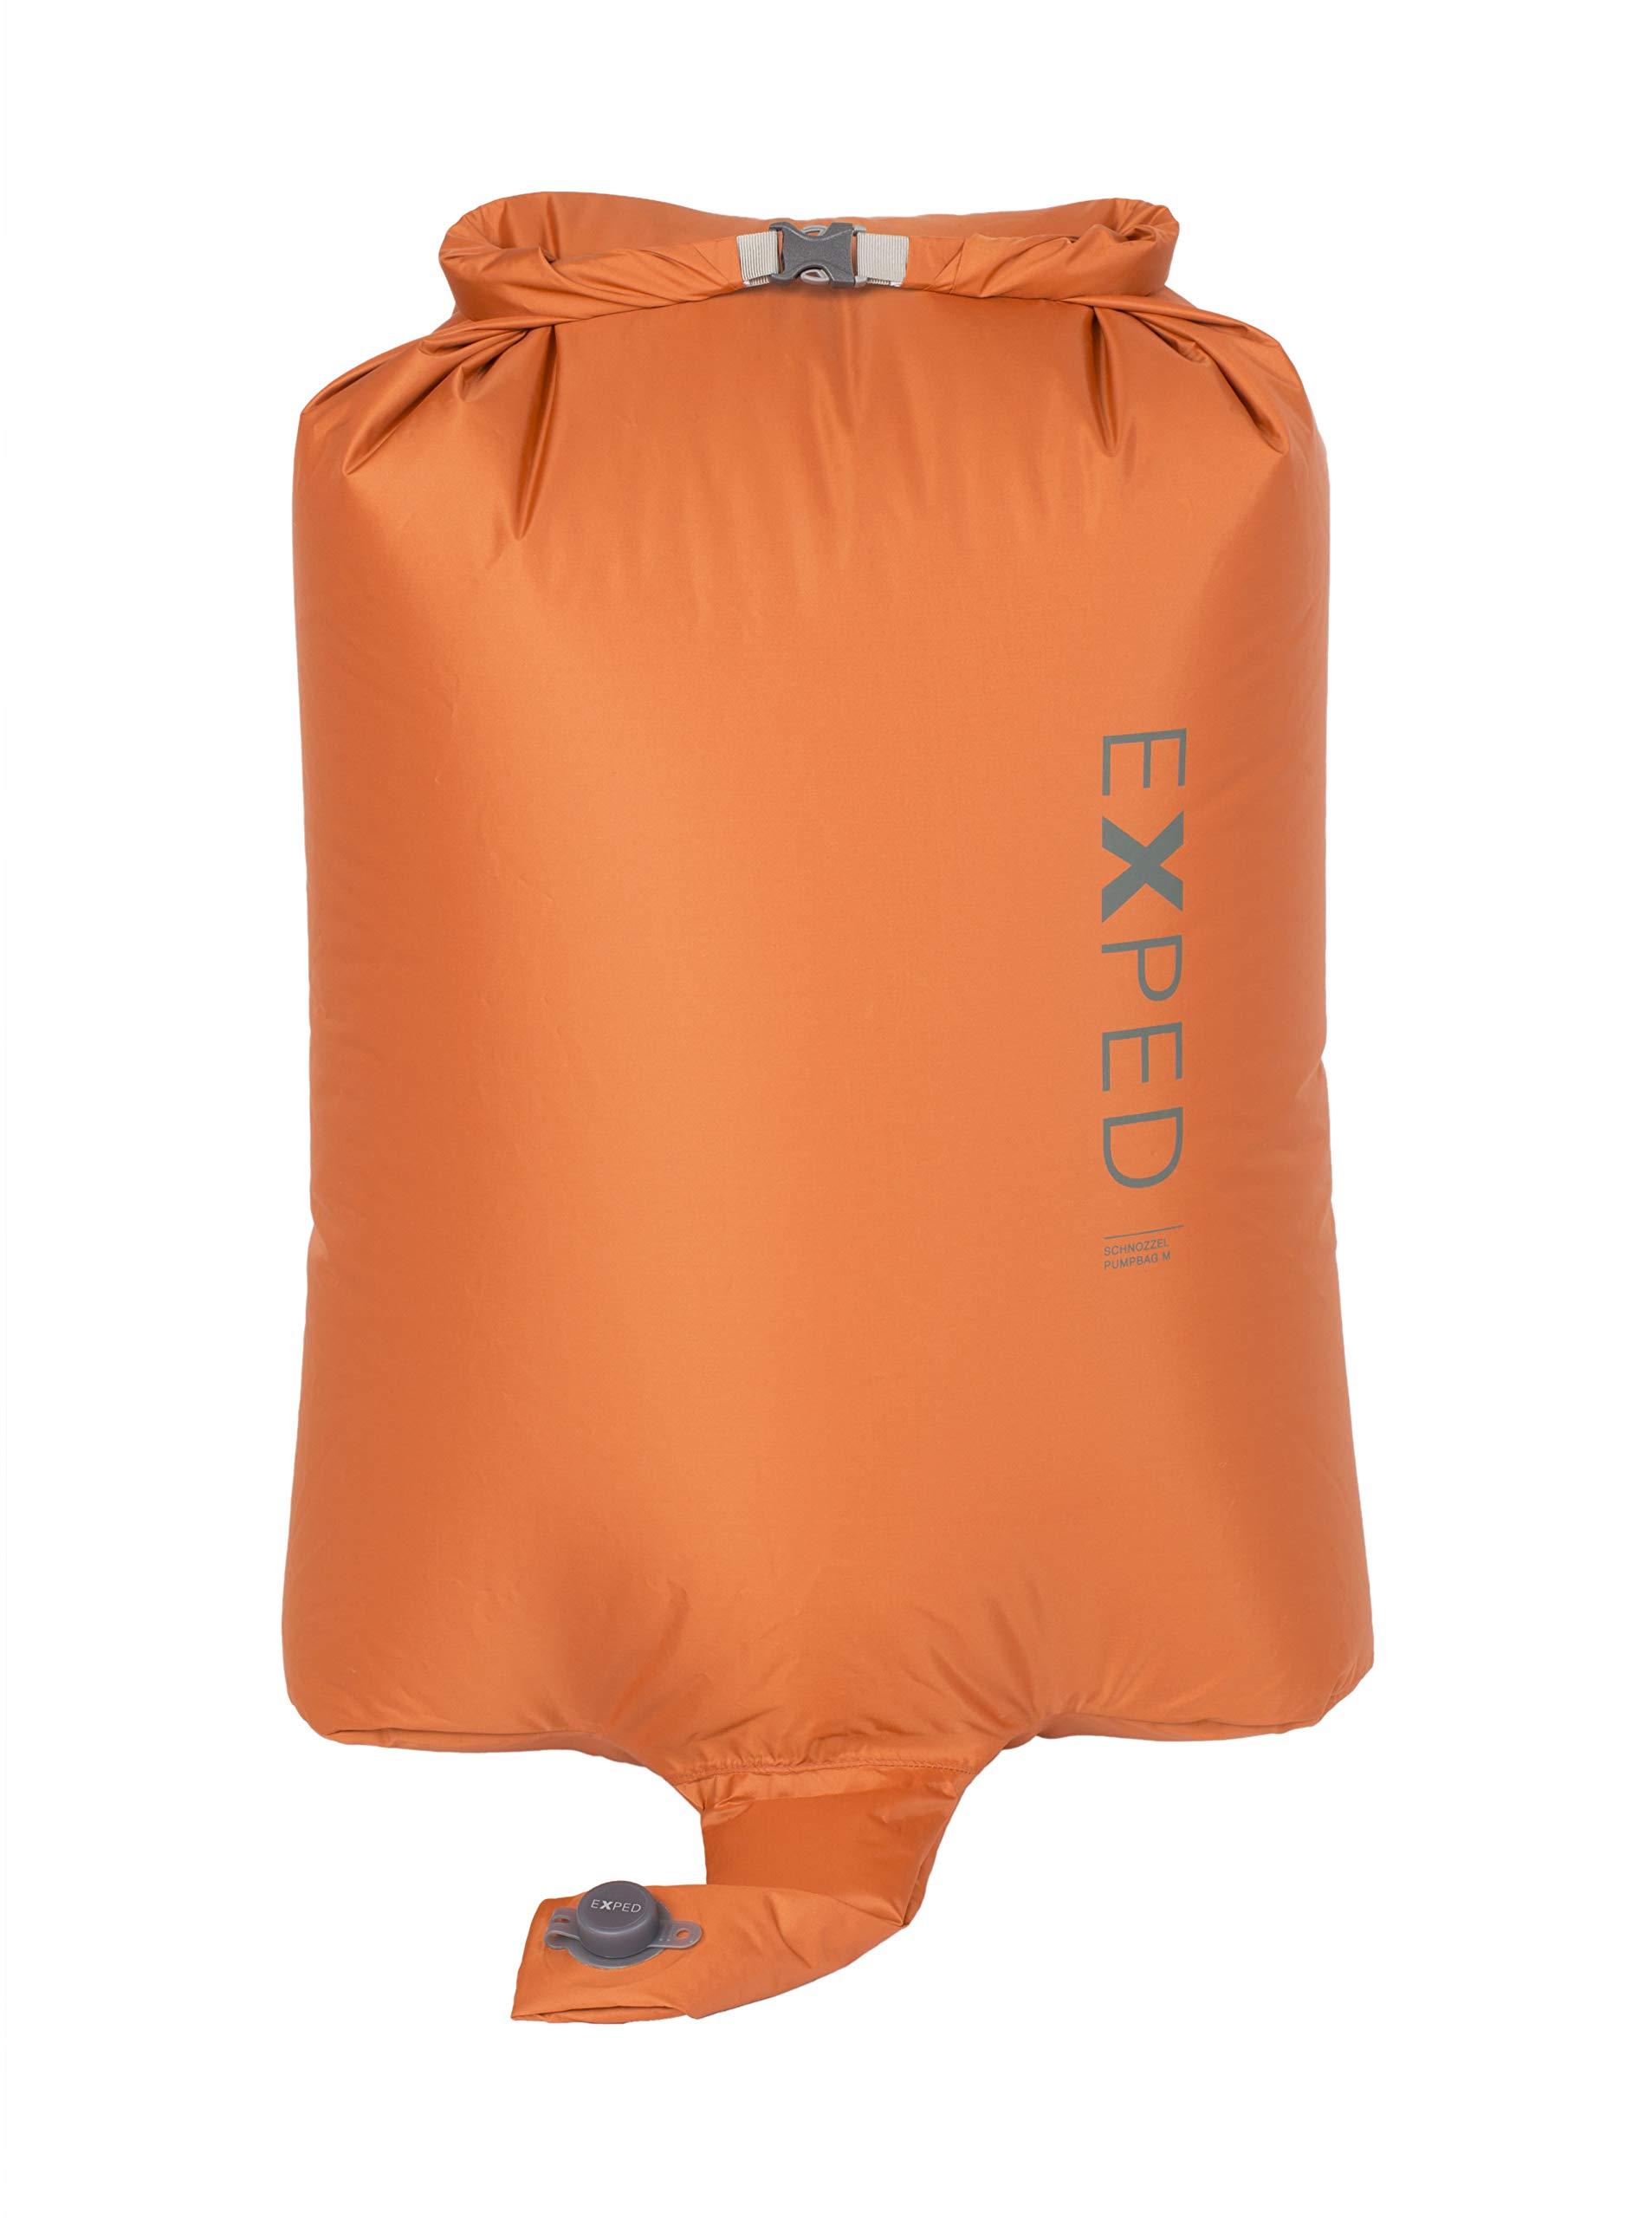 Exped Schnozzel Pumpbag Sleeping Pad Pump, Medium 40L by Exped